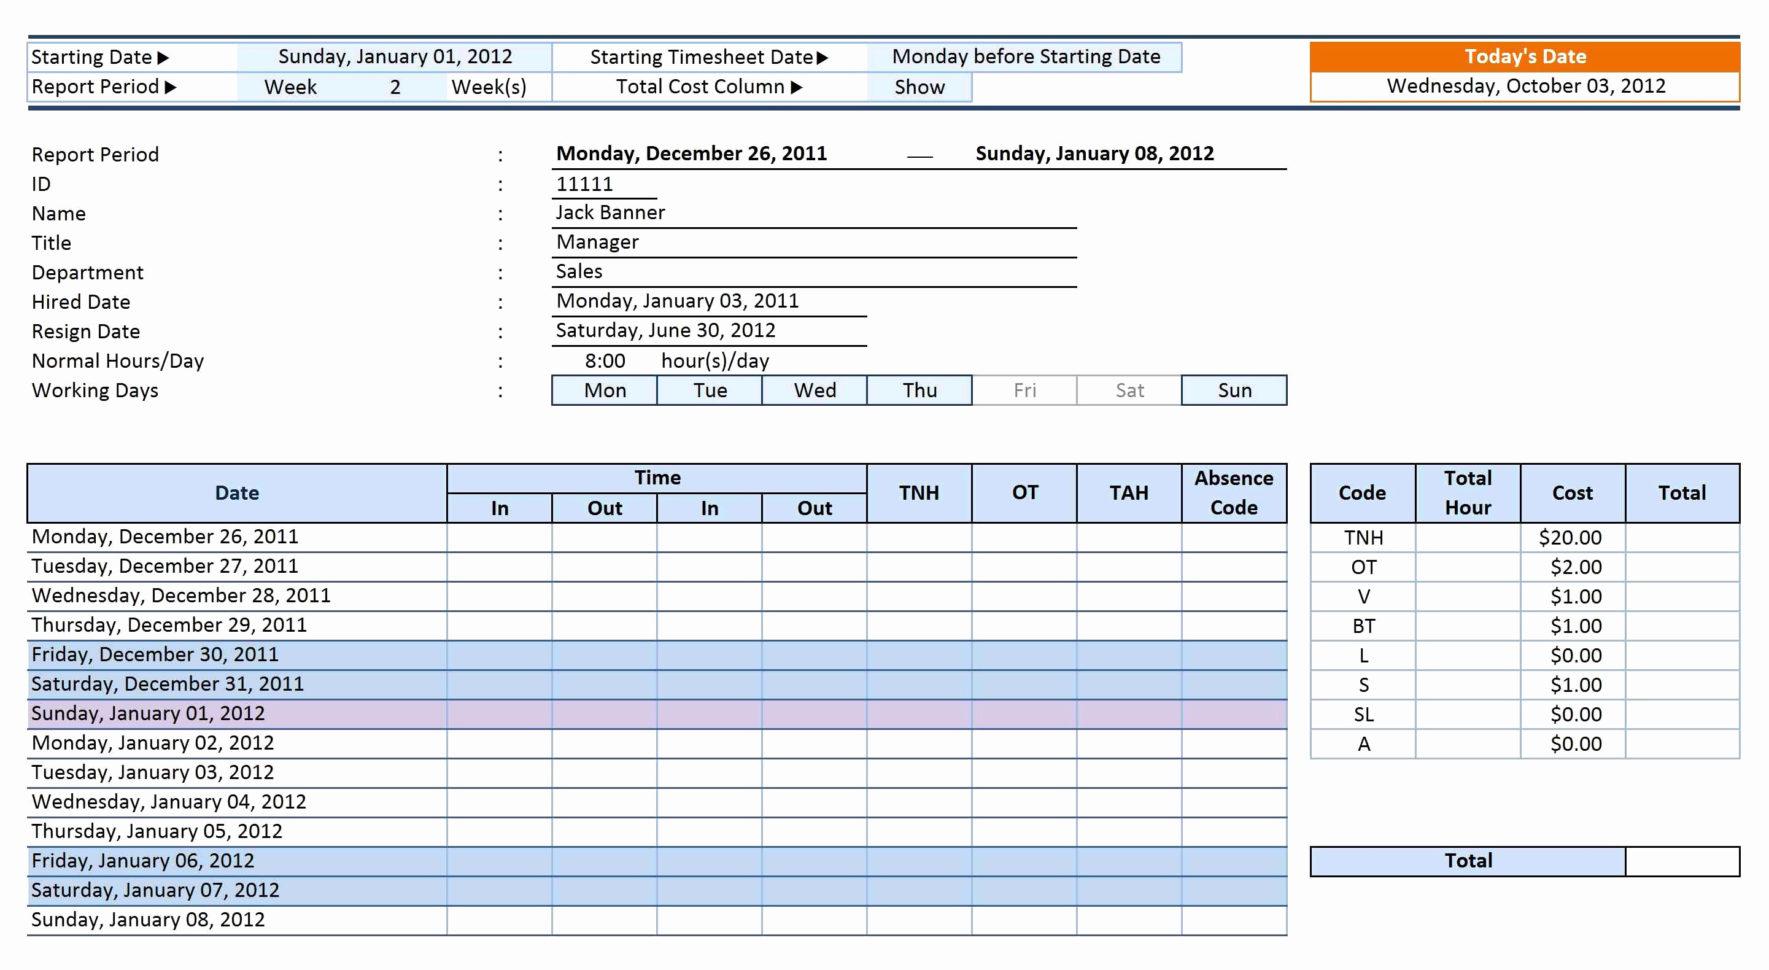 Employee Point System Spreadsheet Regarding Employee Point System Spreadsheet – Spreadsheet Collections